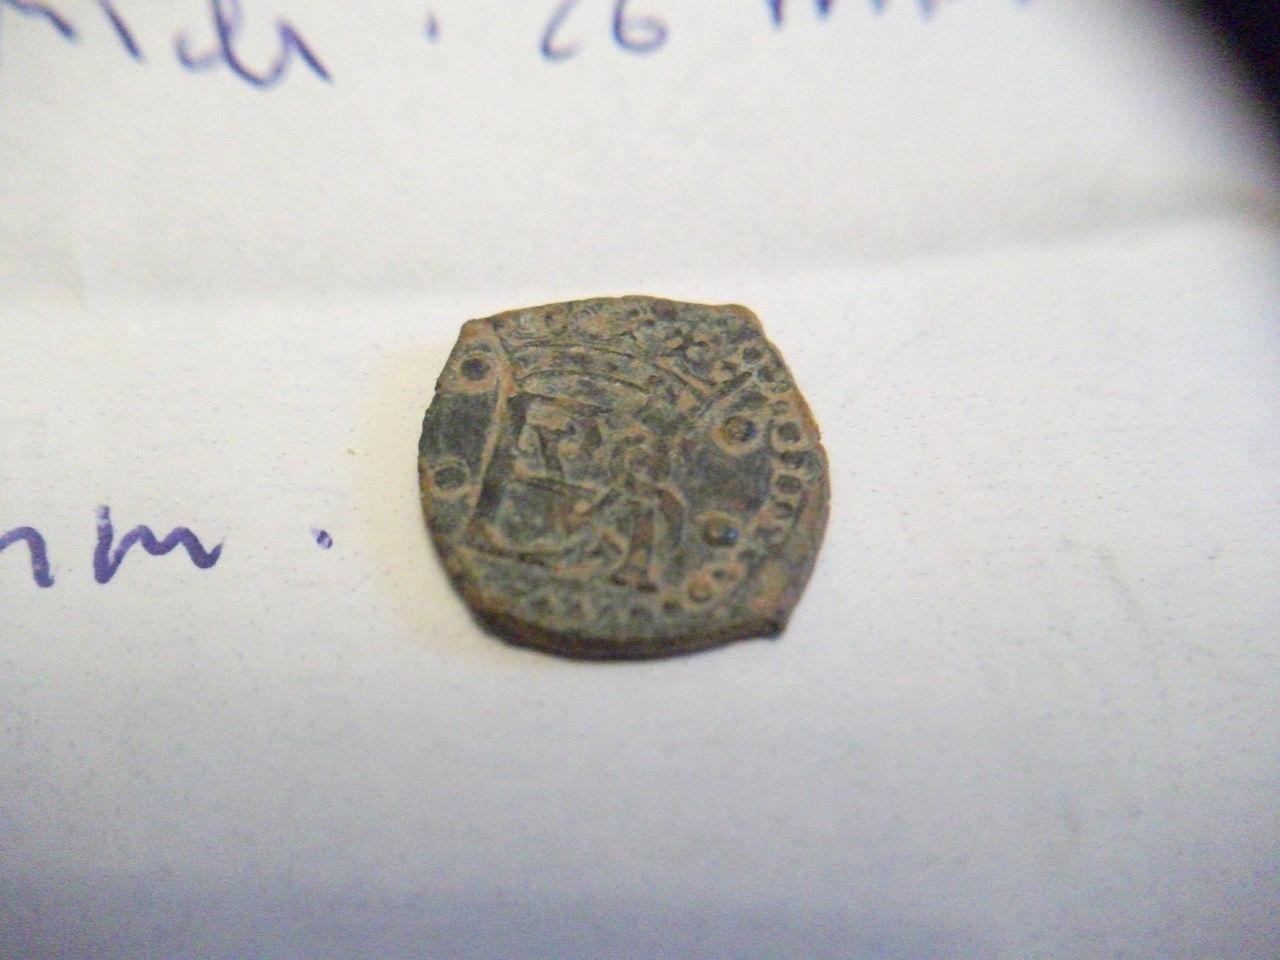 Blanca de Felipe II, de la ceca Burgos. DSCF2066